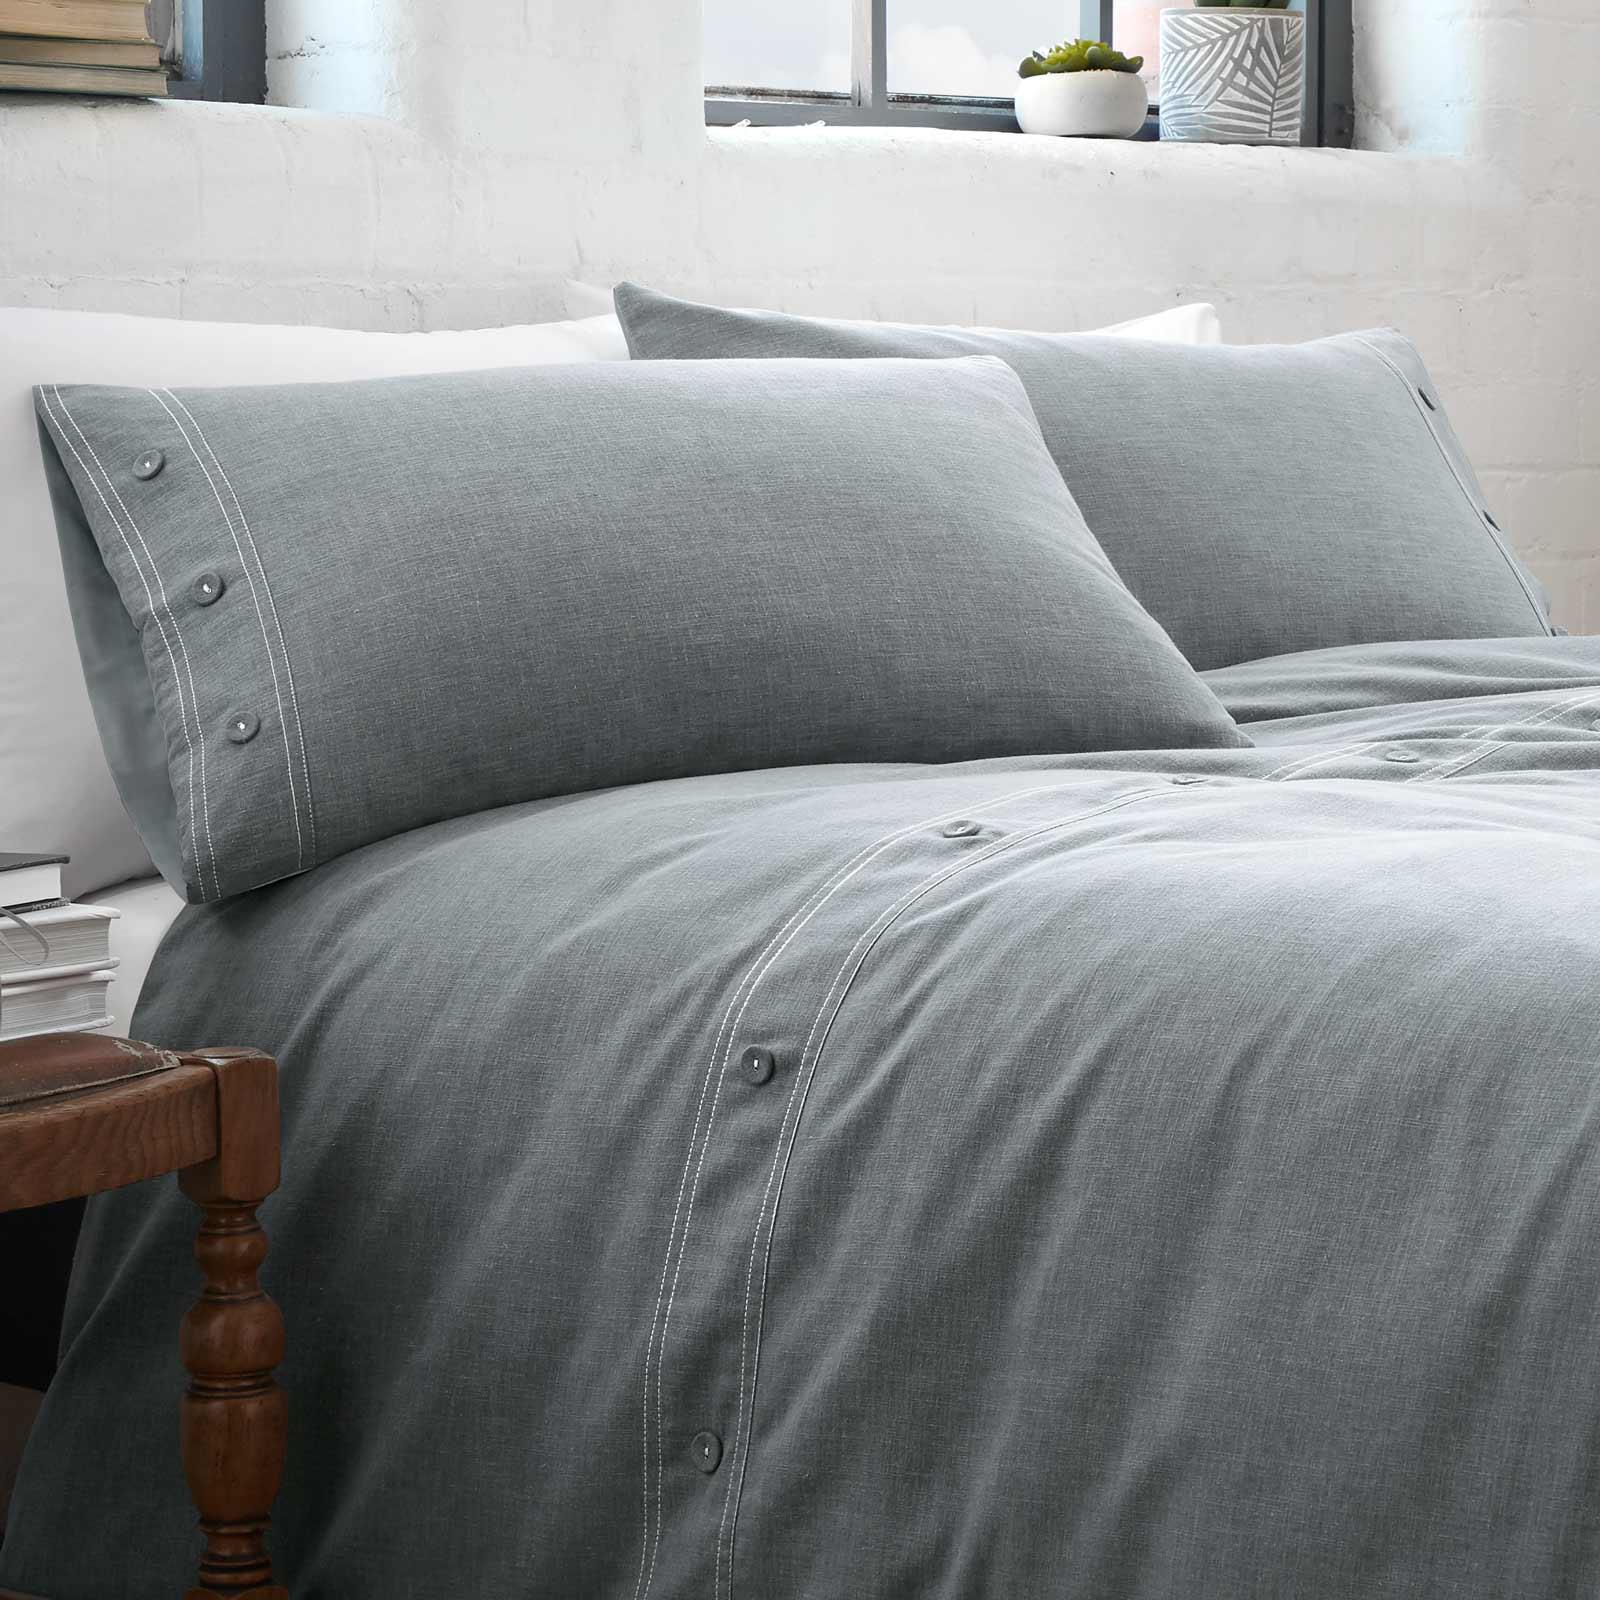 Azul-fundas-nordicas-Denim-Chambray-Boton-Detalle-de-lujo-cubierta-del-edredon-conjuntos-de-cama miniatura 4